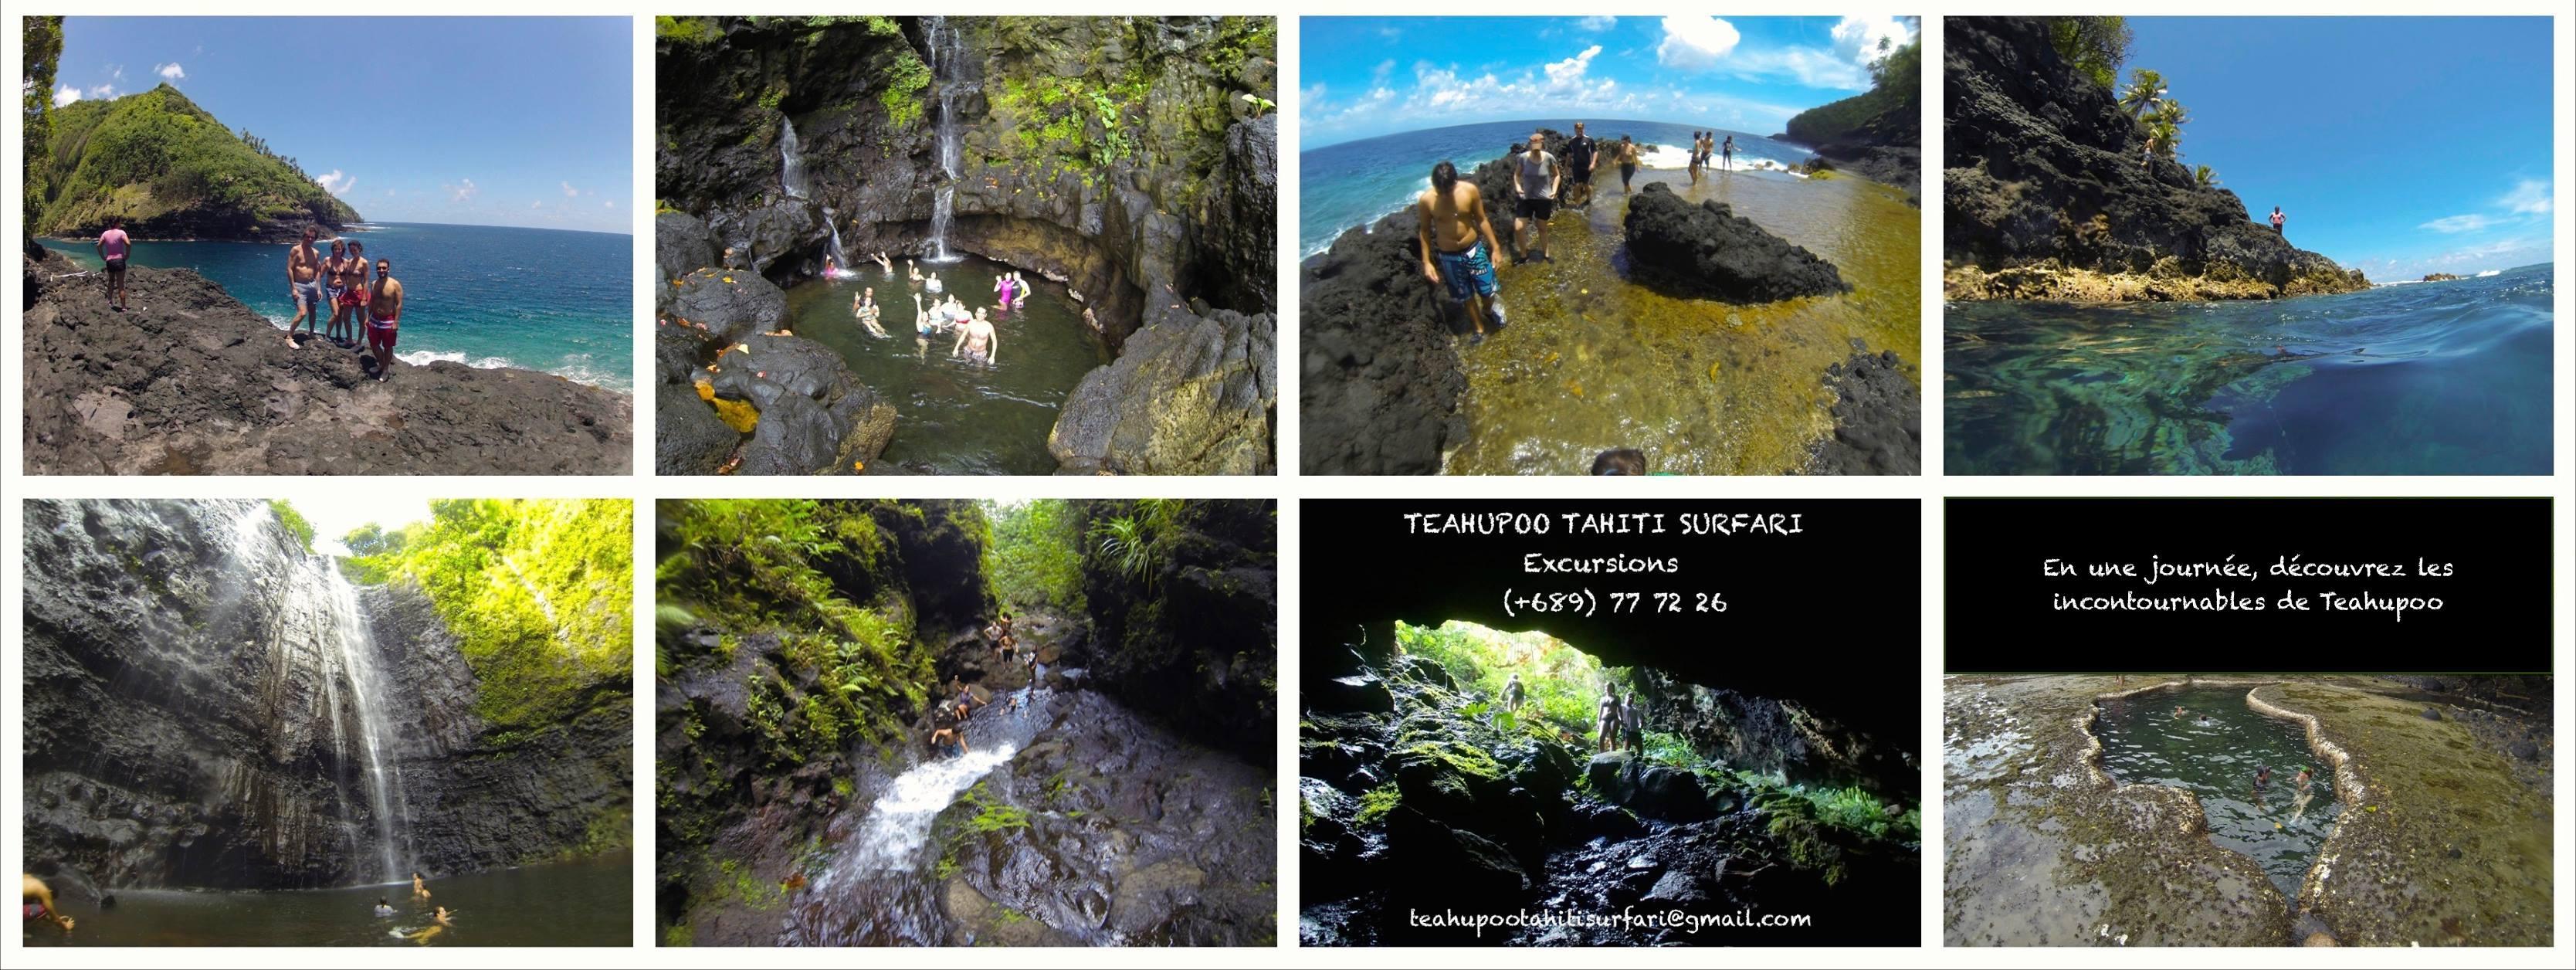 Teahupoo activities